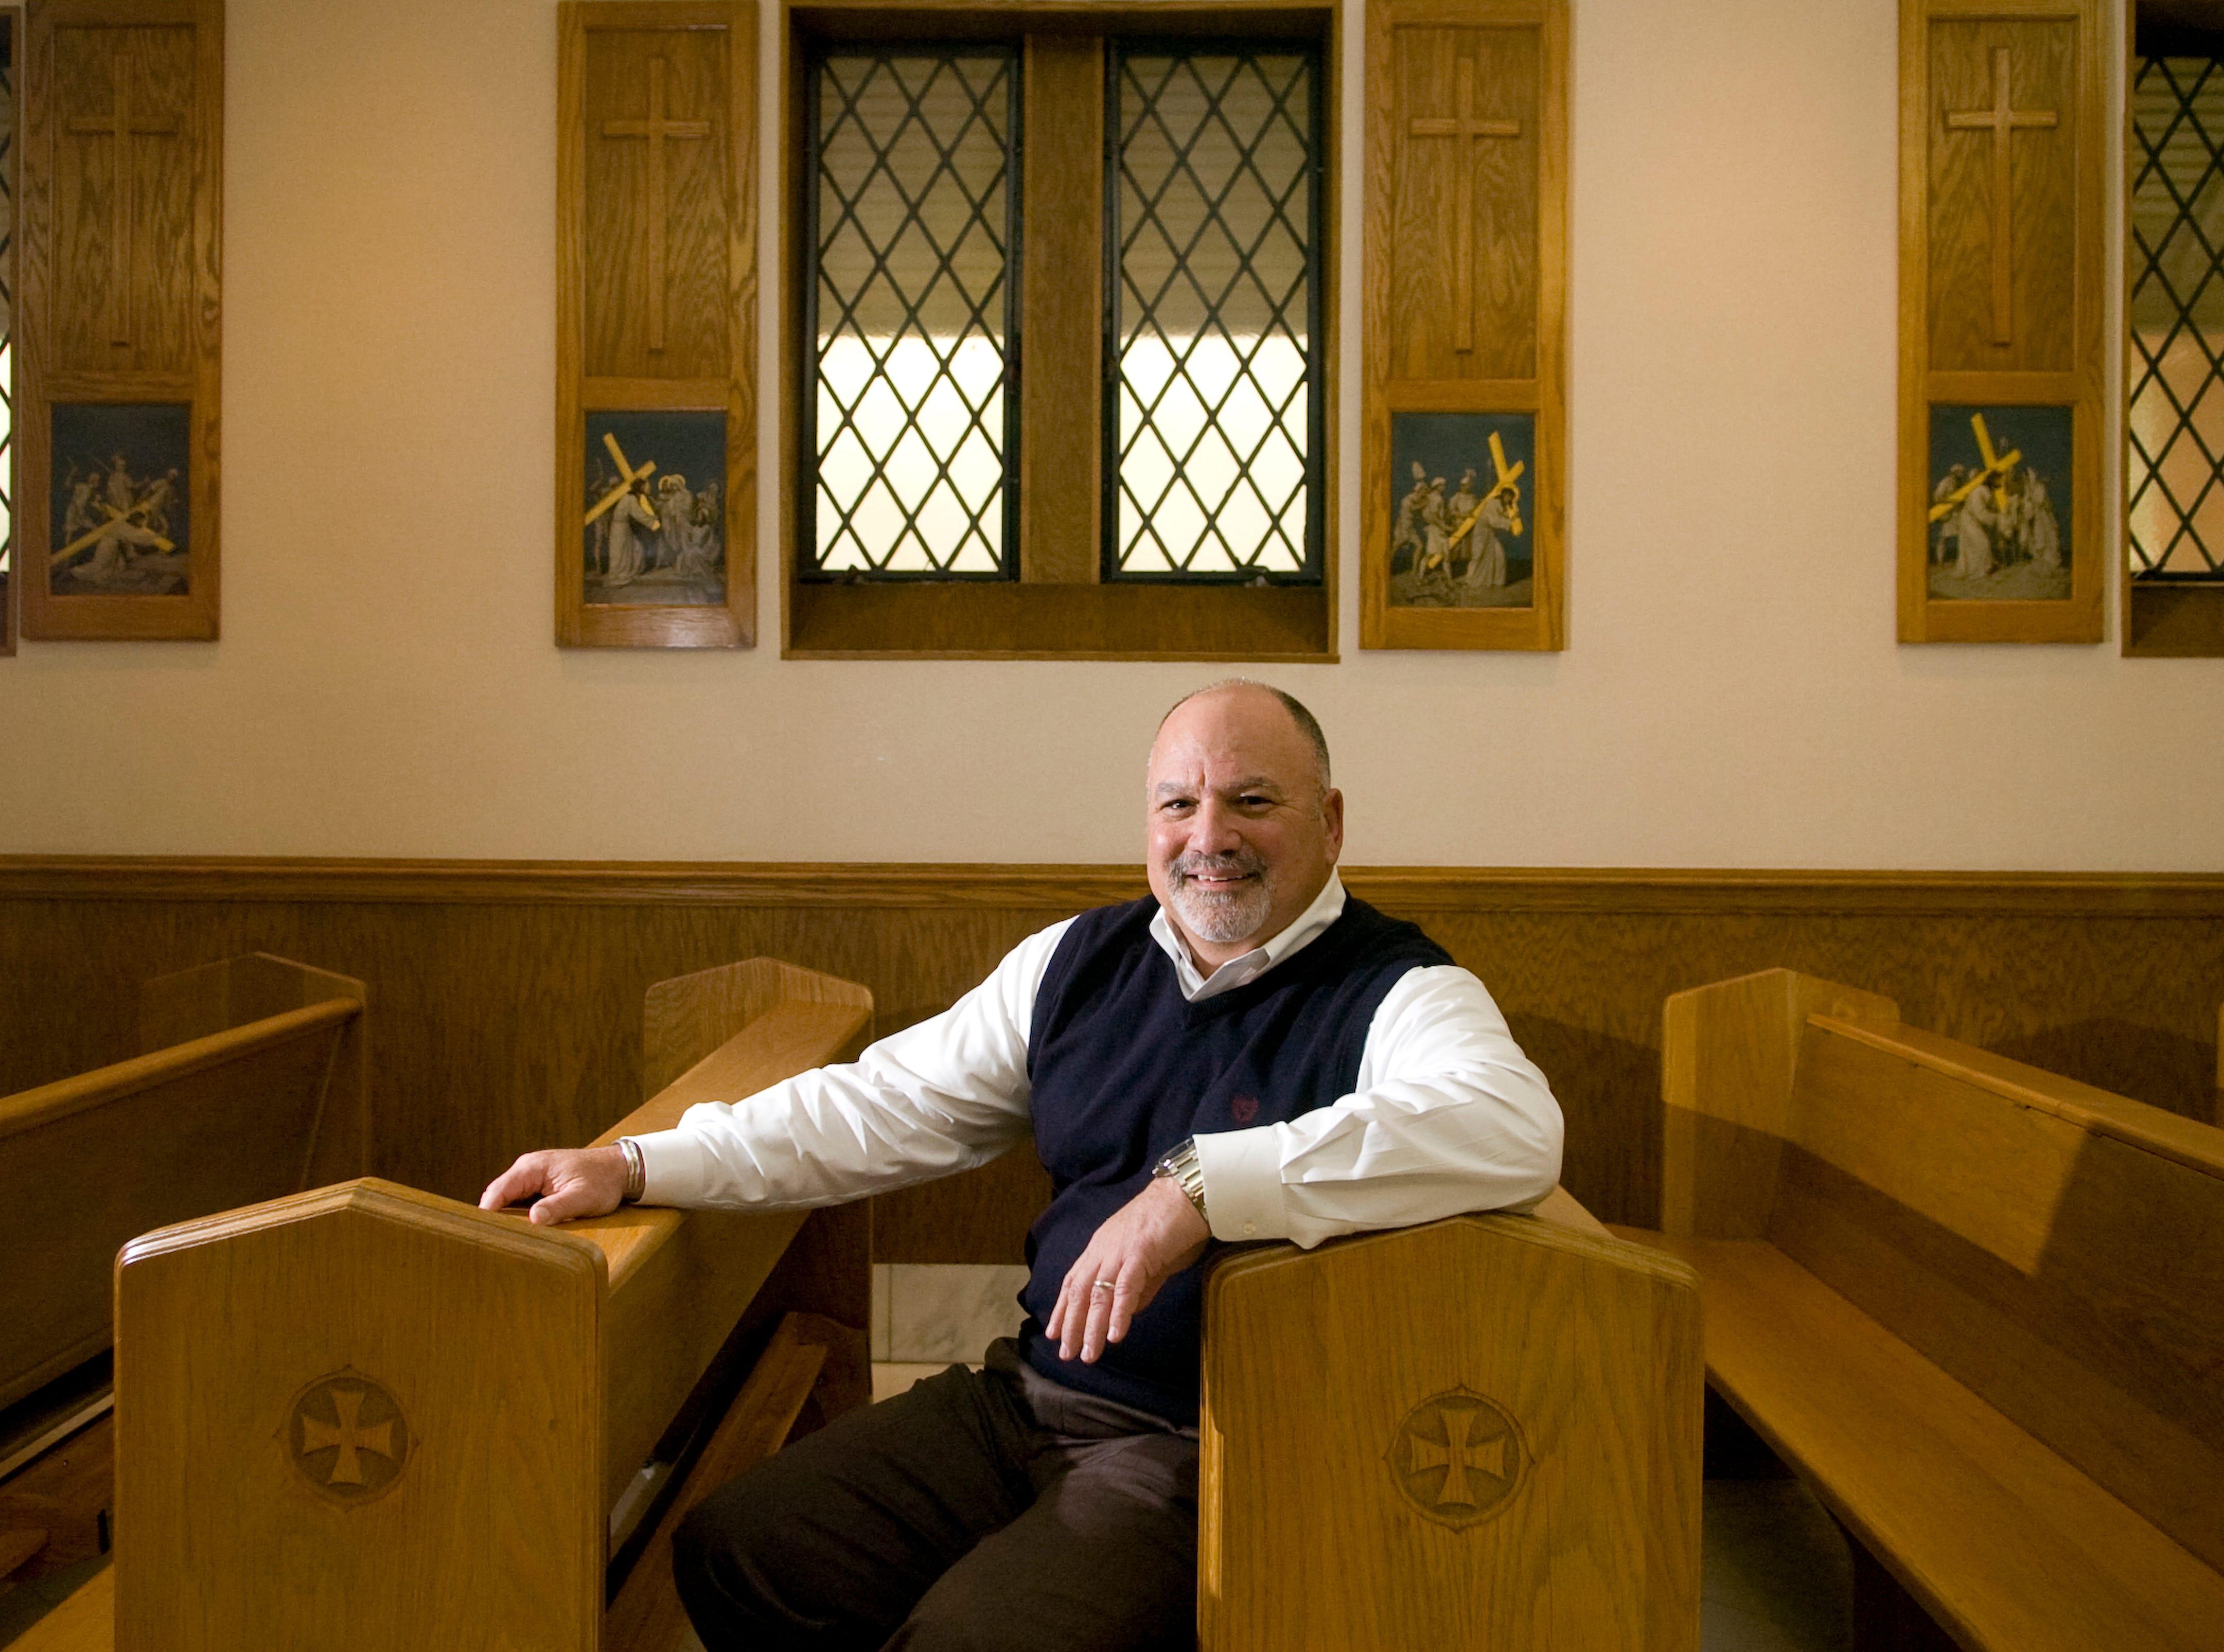 Jeff Ashin, CEO of Mercy Health Partners, photographed inside the chapel at St. Mary's Hospital on Wednesday, January 19, 2011.